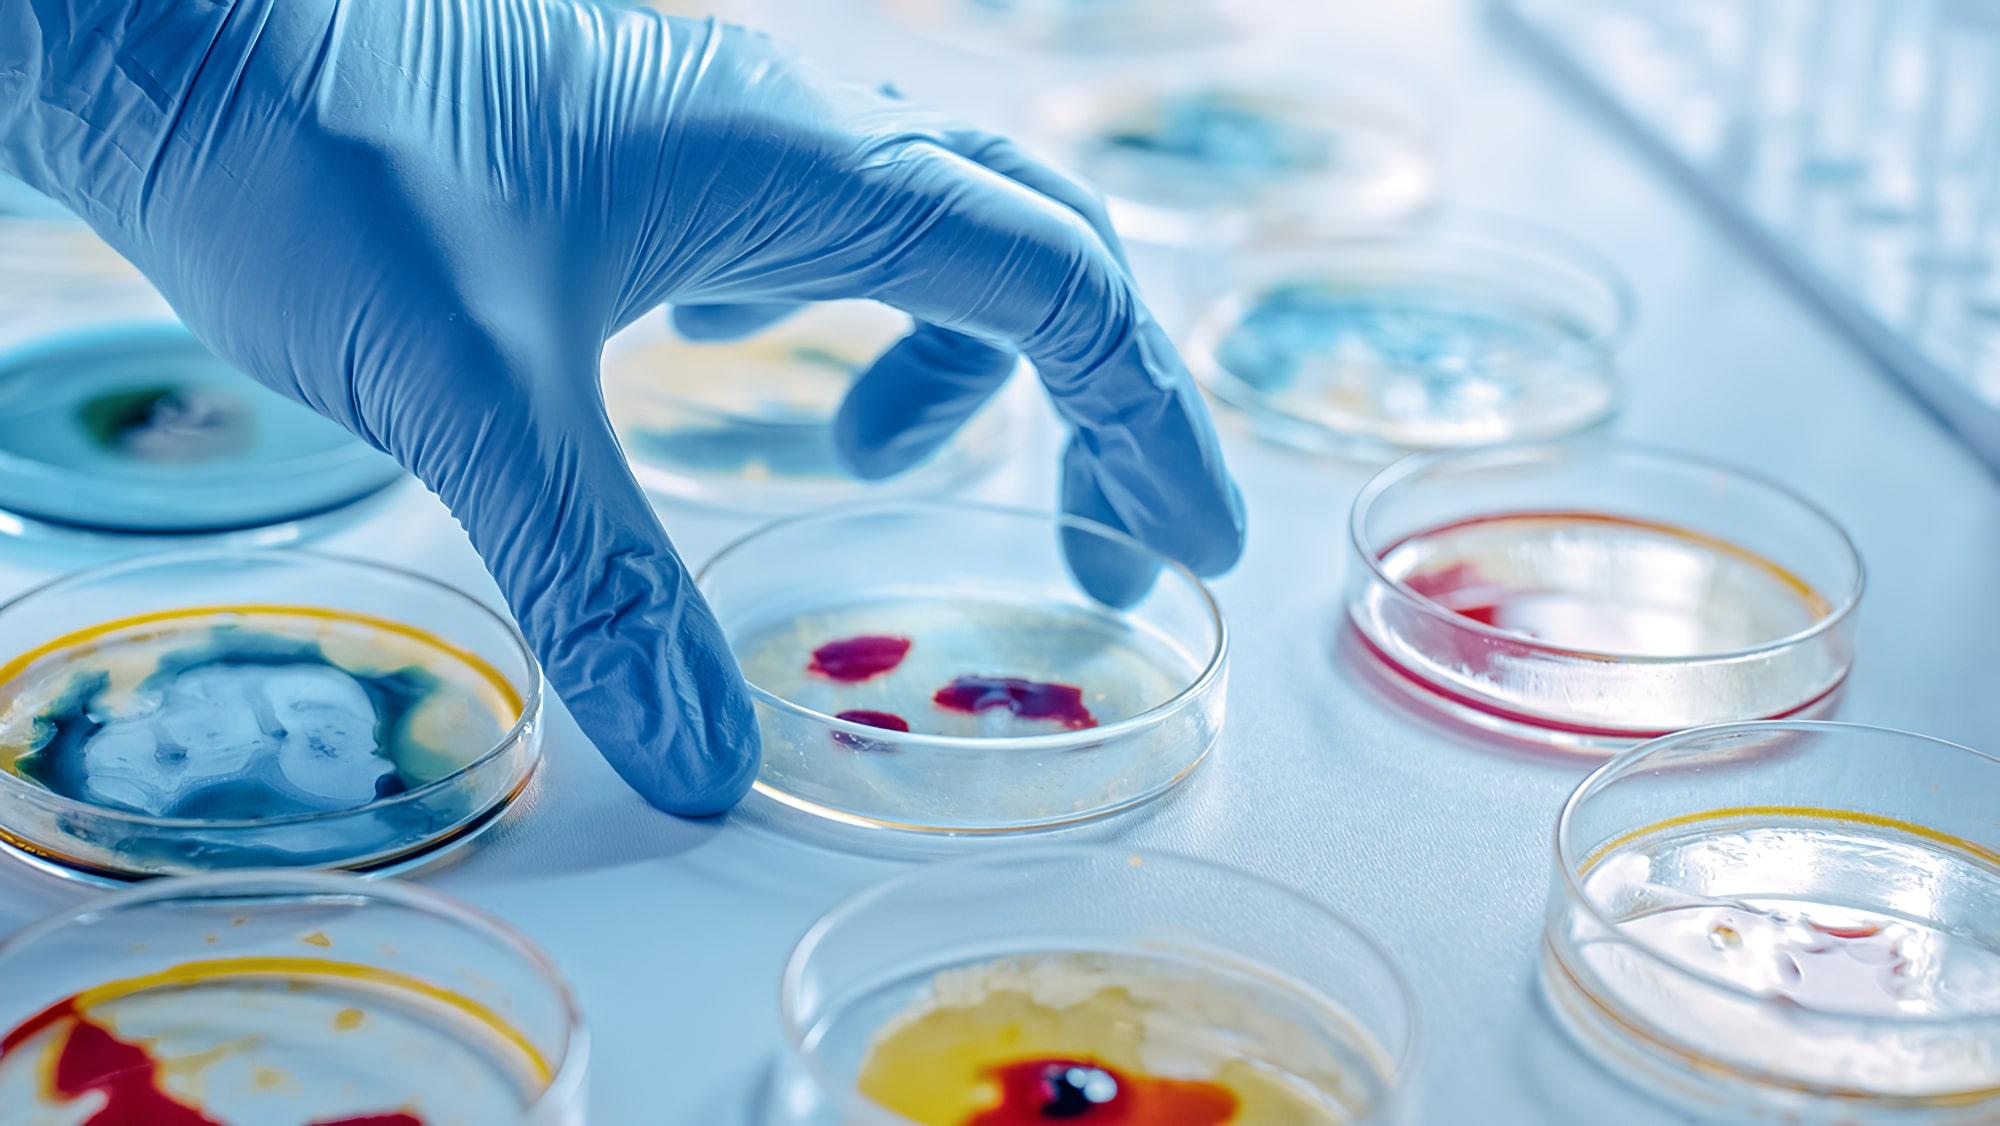 Mikrobiyoloji Analizi